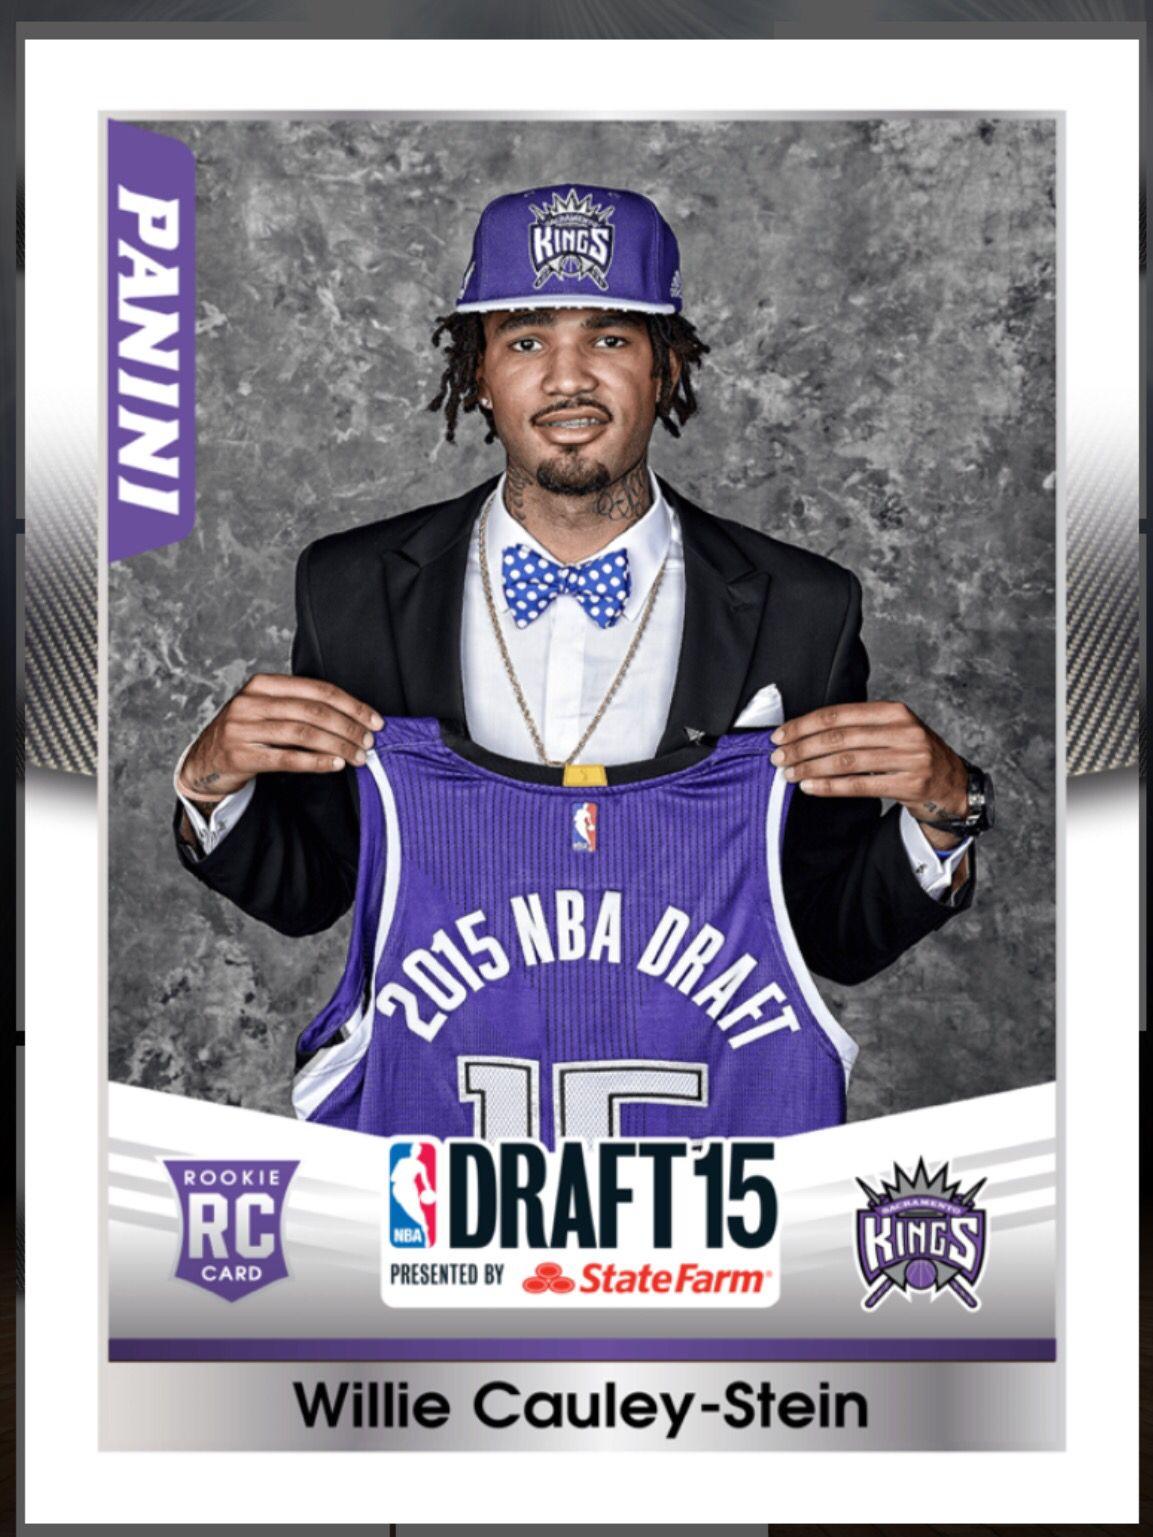 Willie CauleyStein (Rookie) Sacramento Kings Draft 2015